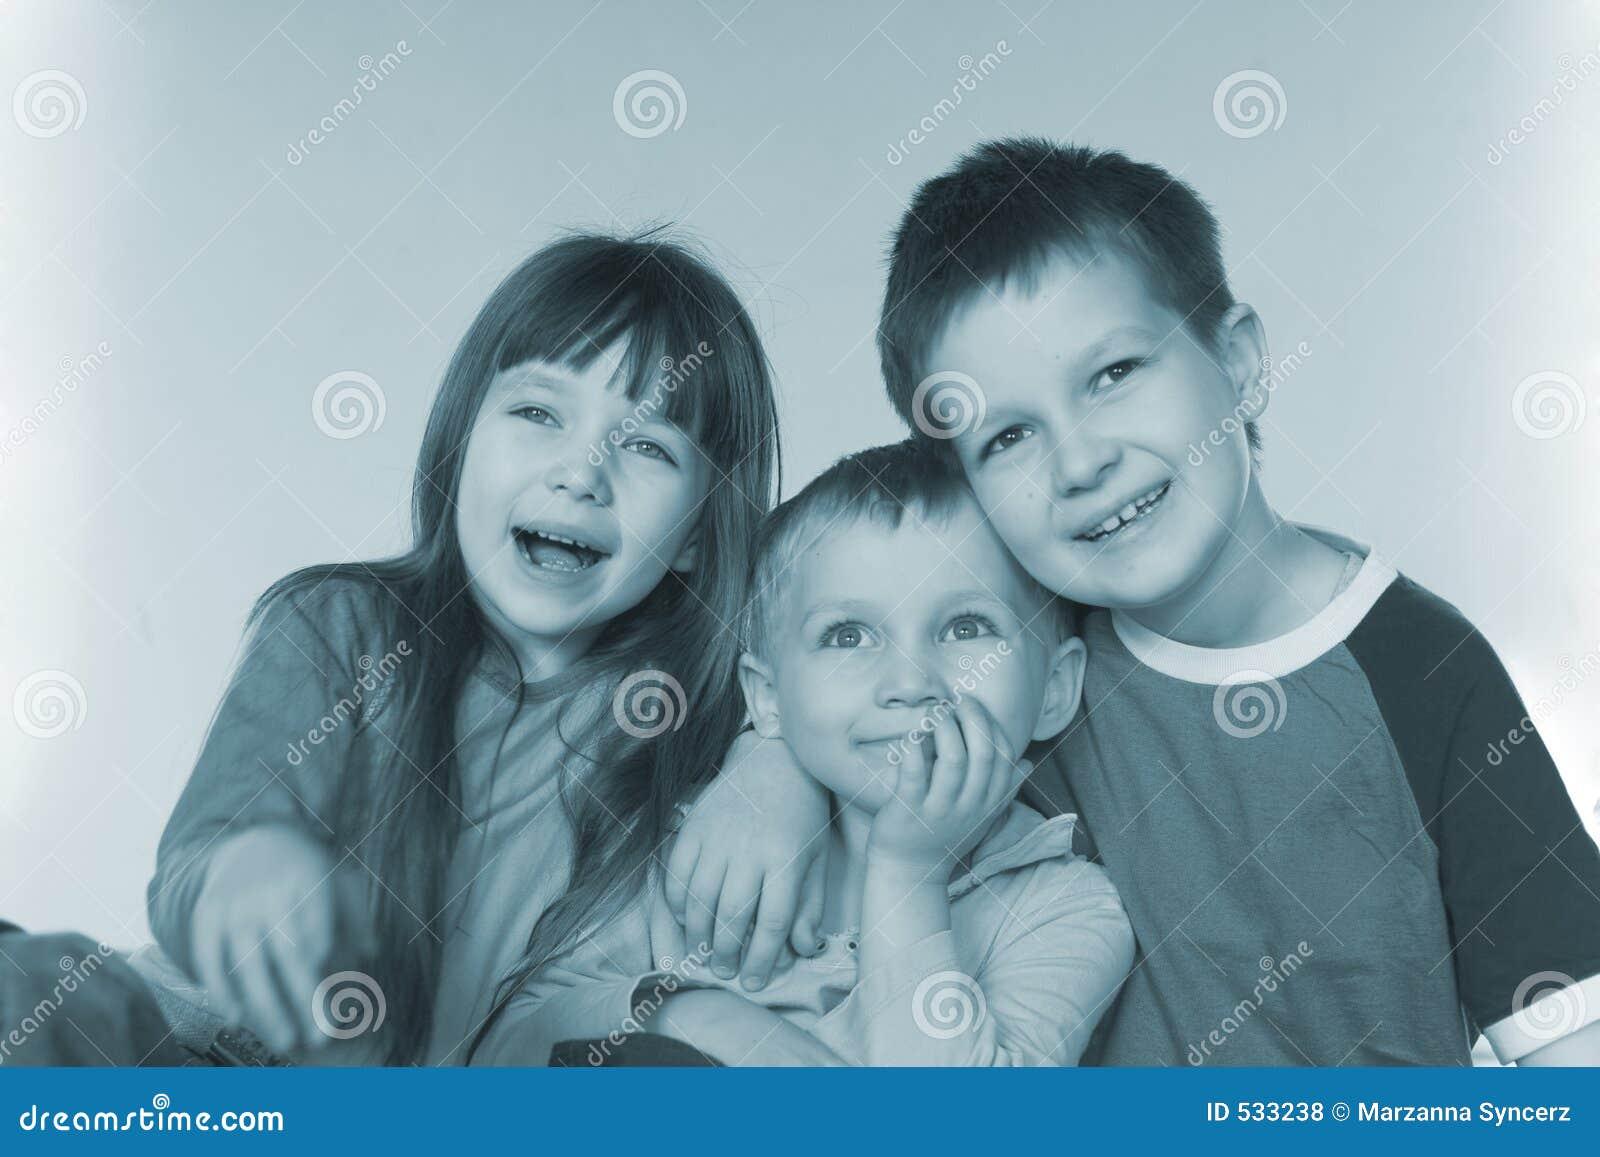 Download 儿童微笑的年轻人 库存照片. 图片 包括有 团体, 女孩, 子项, 孩子, 表面, 可爱, 微笑, 幸福, 姐妹 - 533238